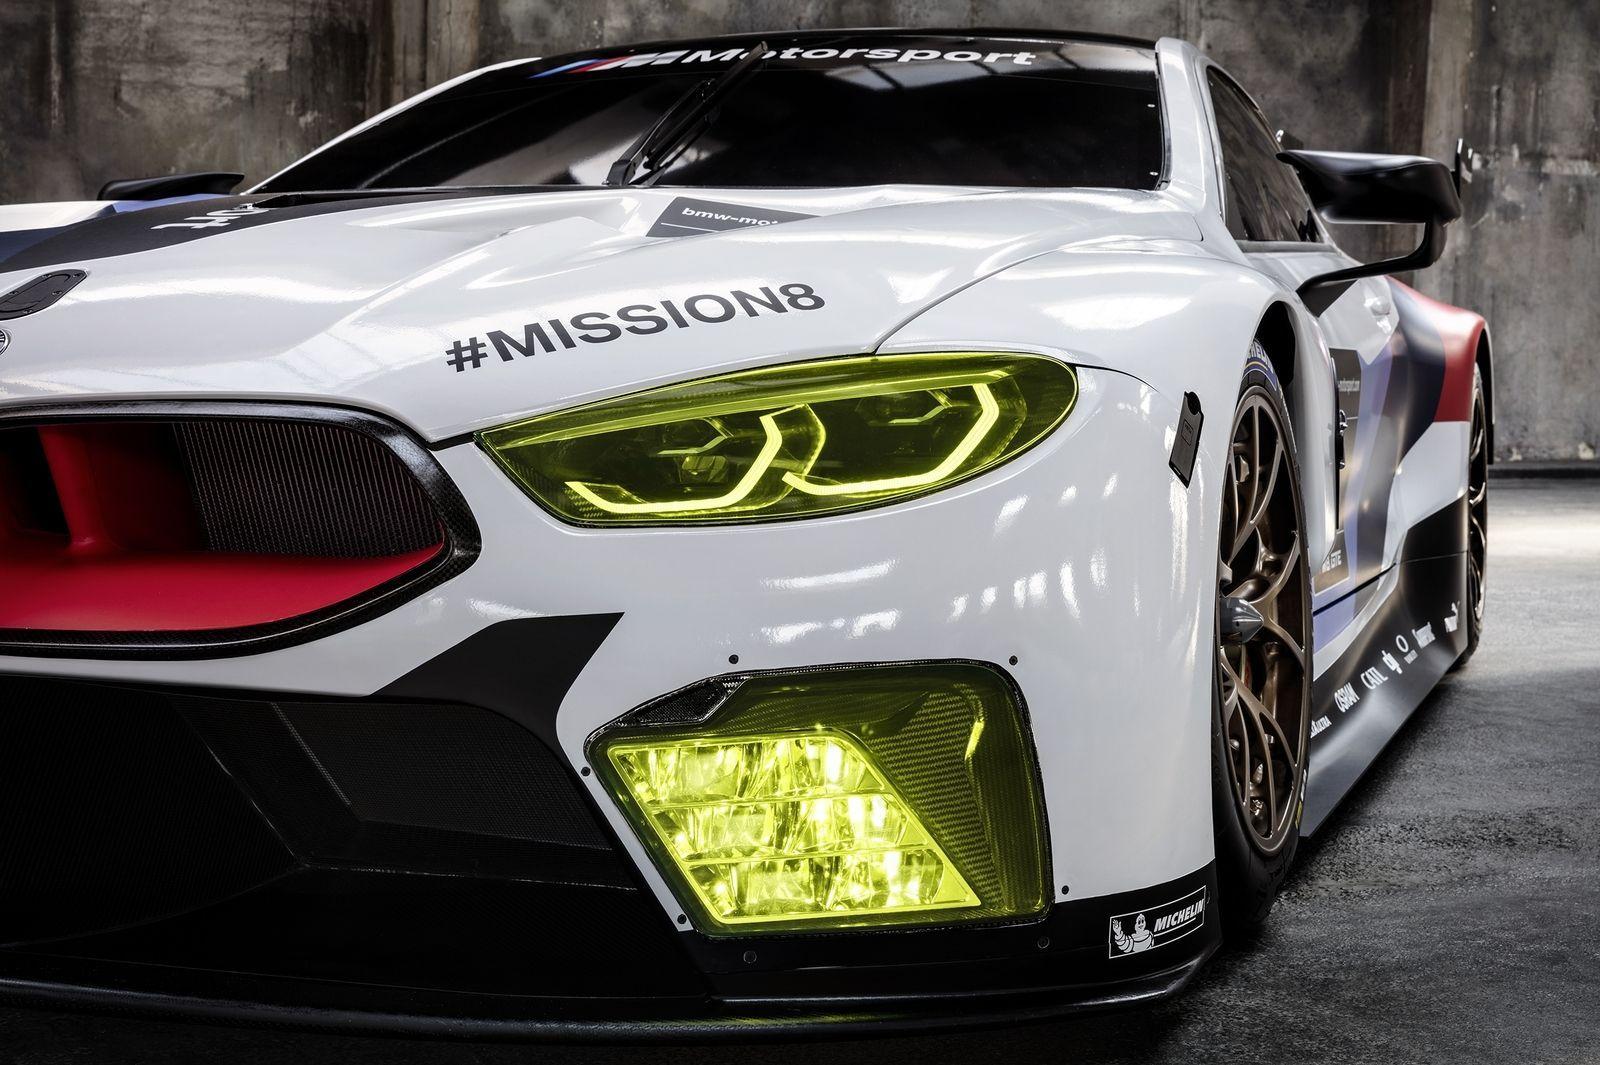 The Bmw M8 Gte Has Huge Kidney Grille Nostrils Bmw Sport Race Cars Bmw Cars Bmw m8 gte frankfurt motor show